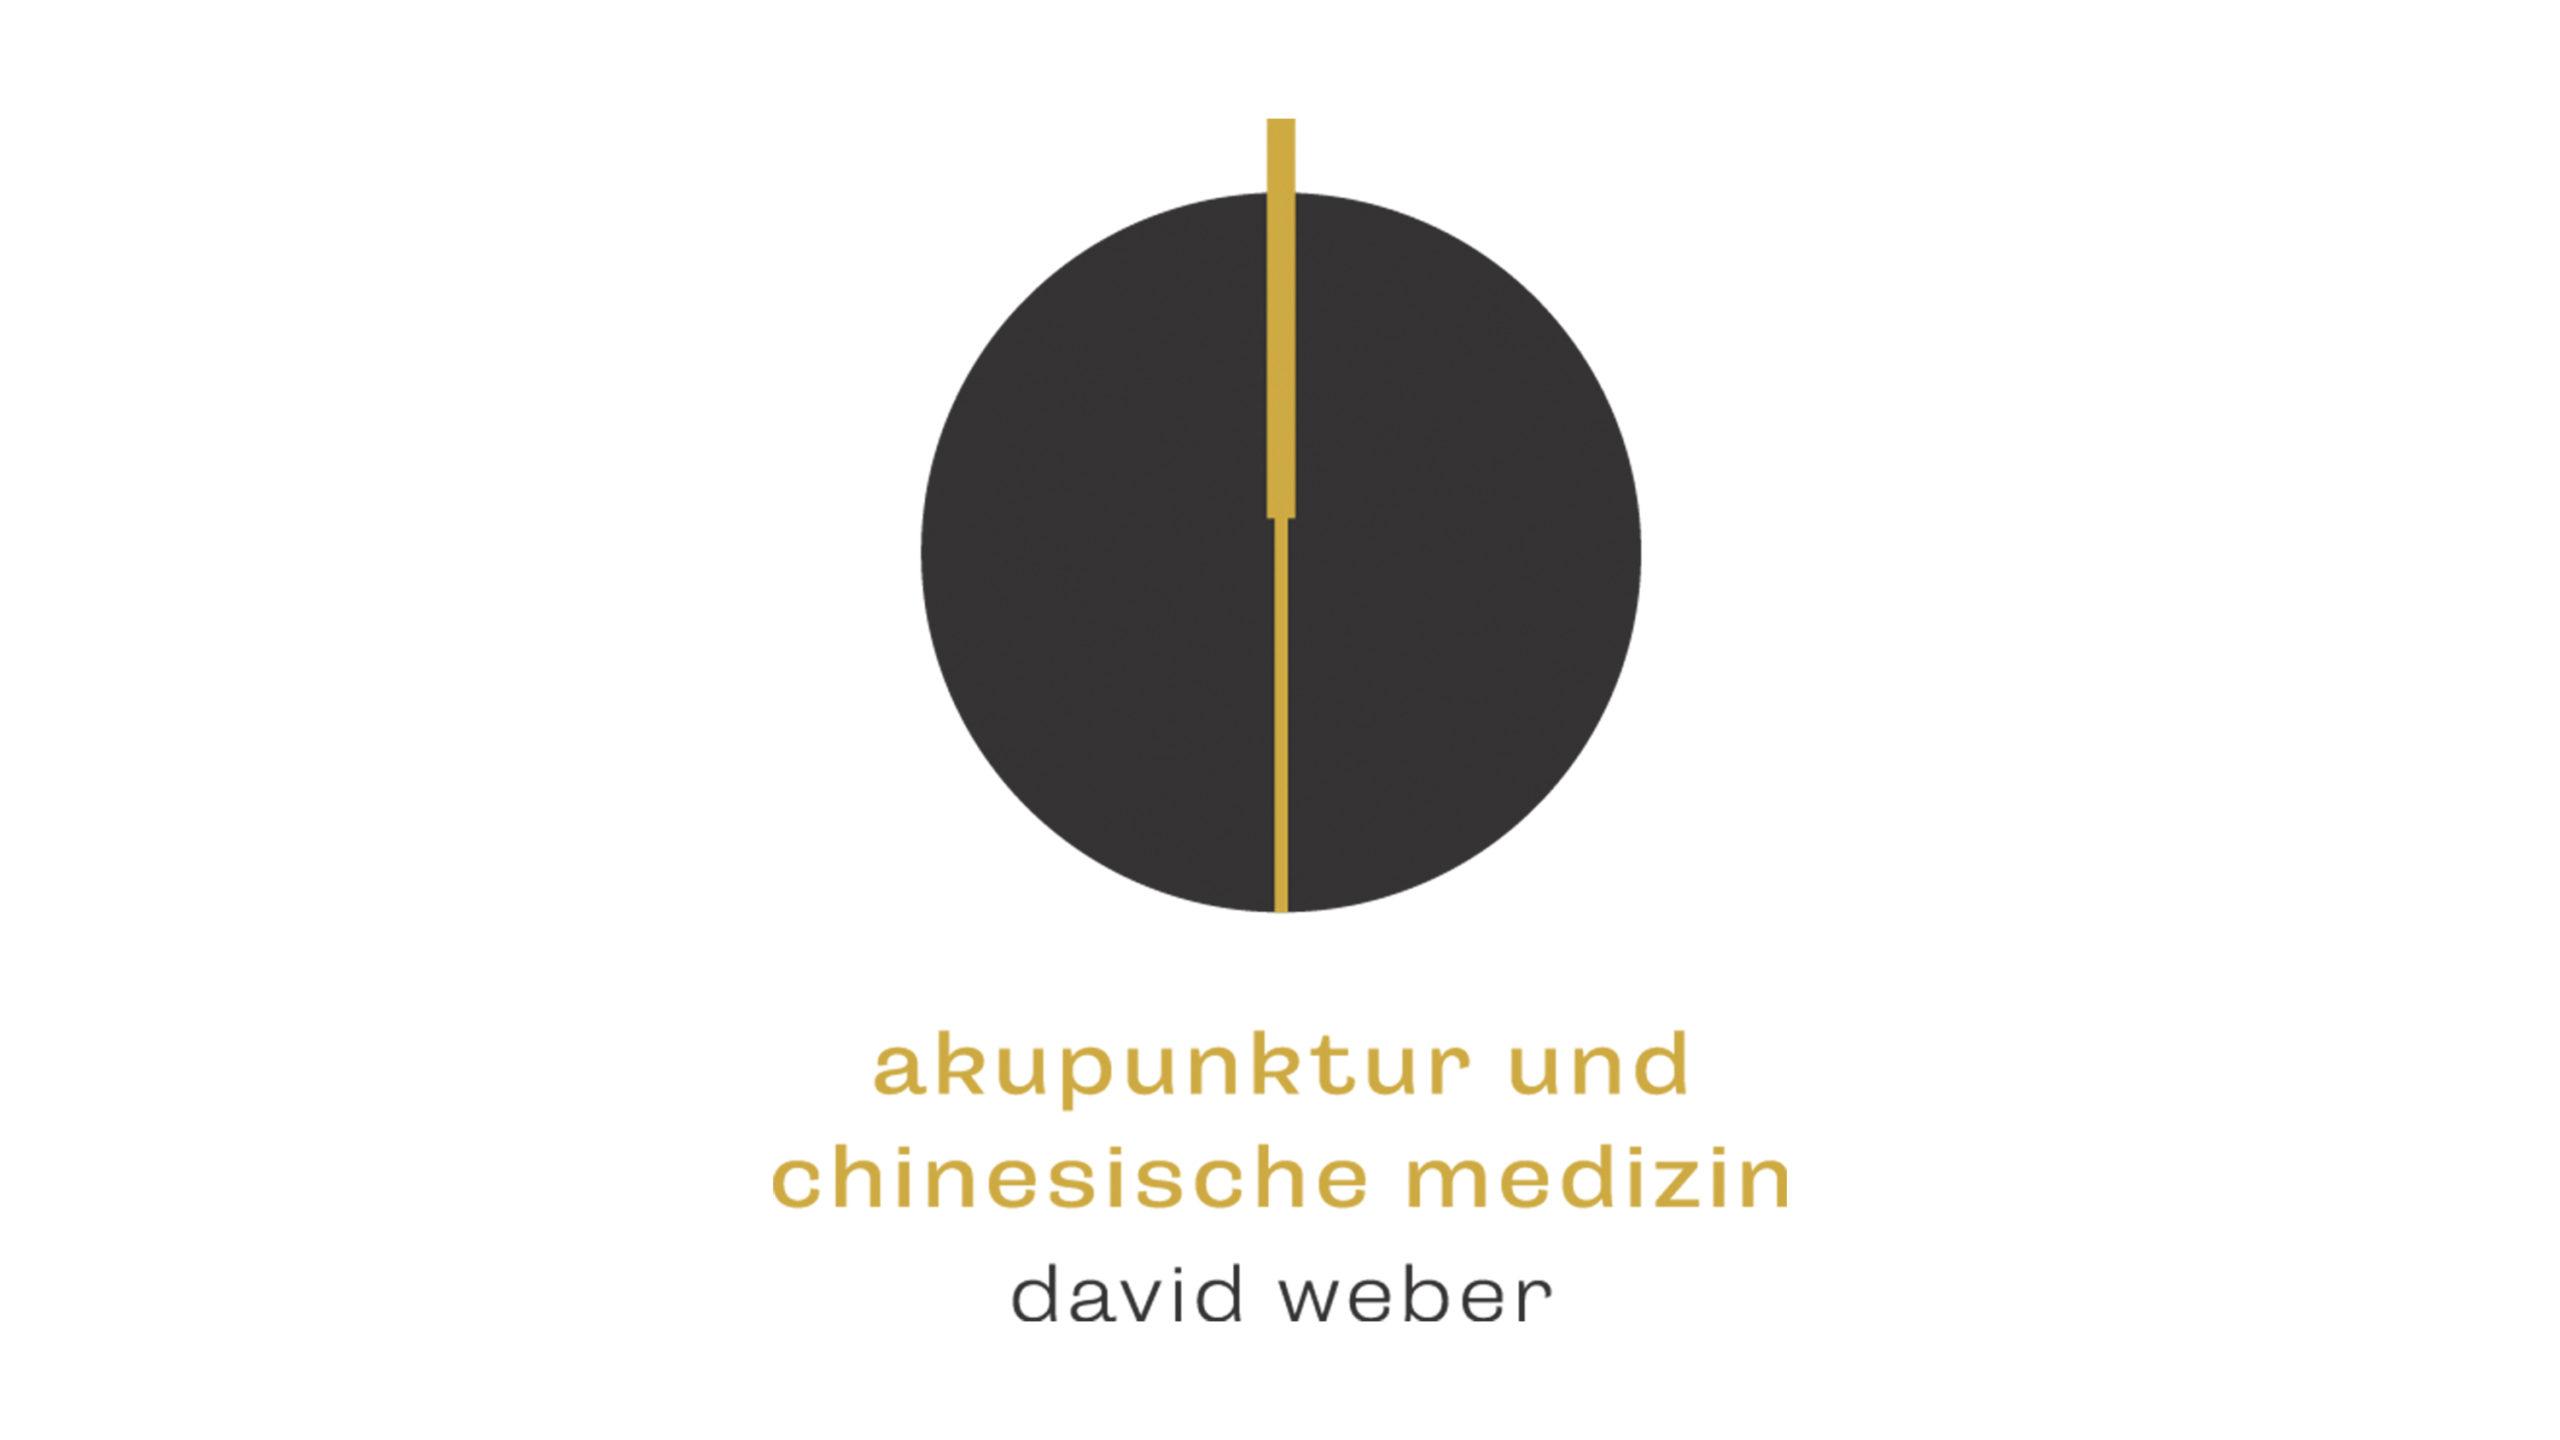 Akupunktur_Bern_Logo_Webseite_David_Weber_Manuel_Ort_Grafik_Atelier1